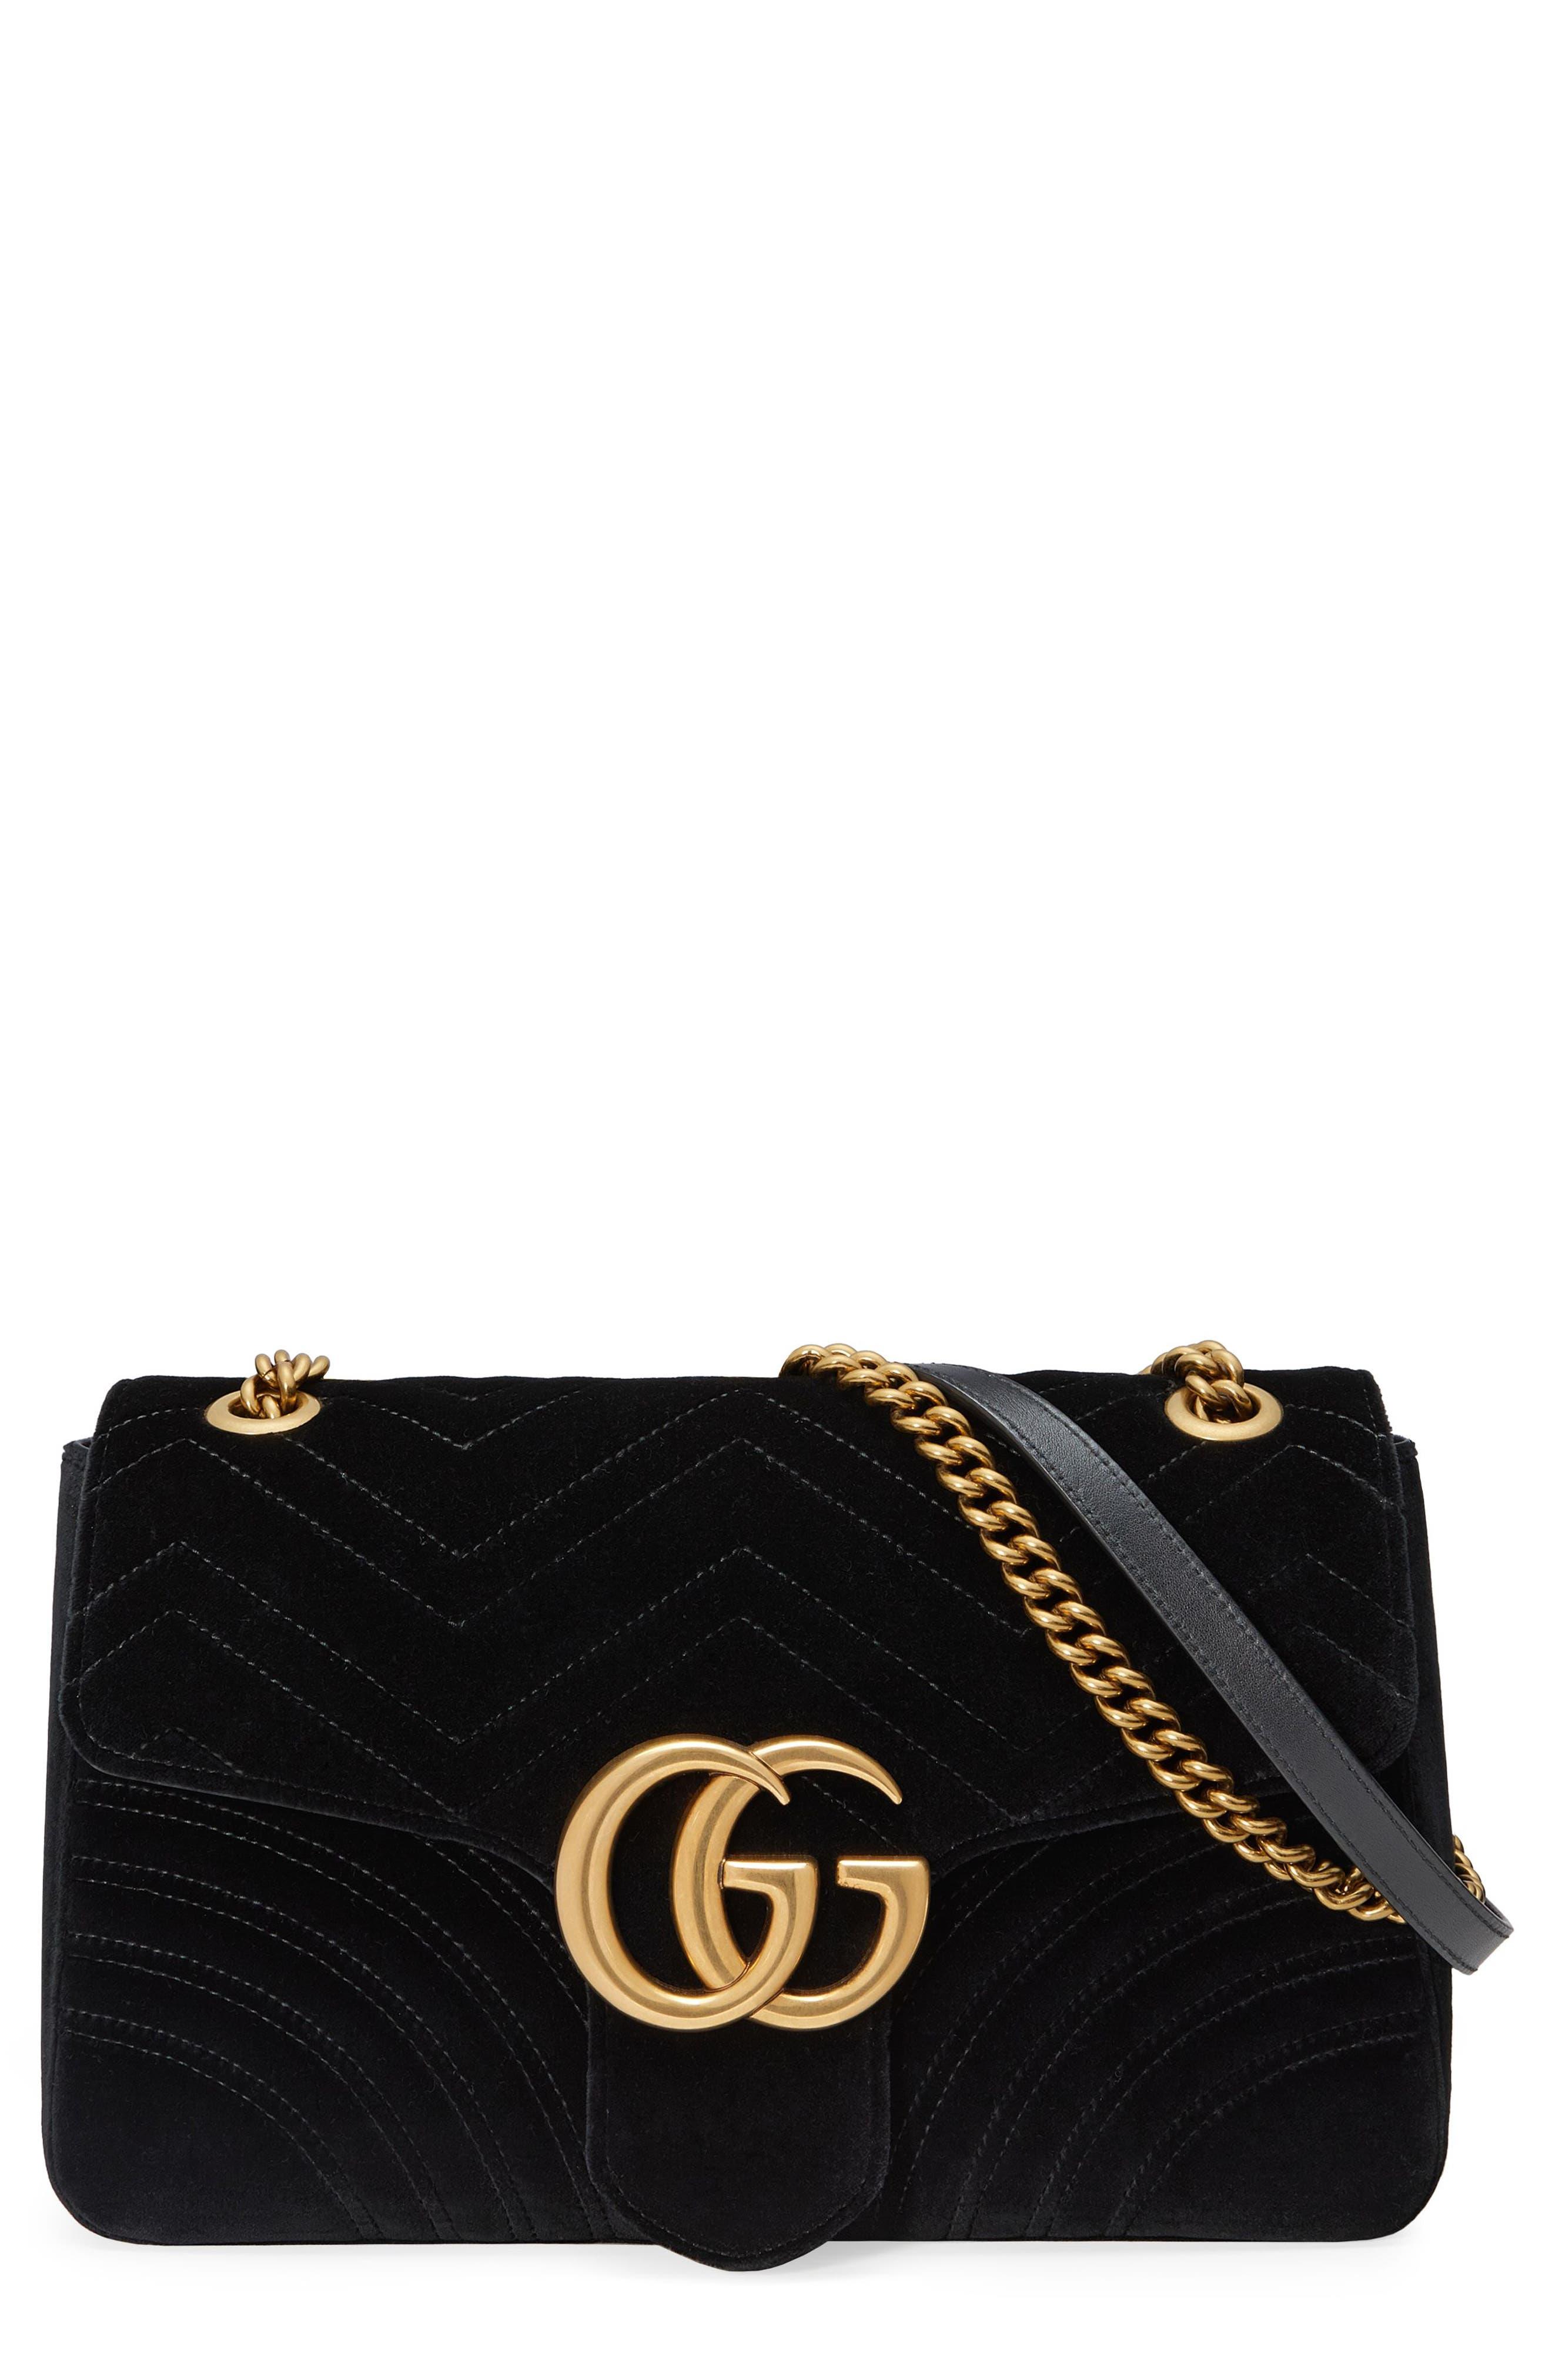 Main Image - Gucci Medium GG Marmont 2.0 Matelassé Velvet Shoulder Bag